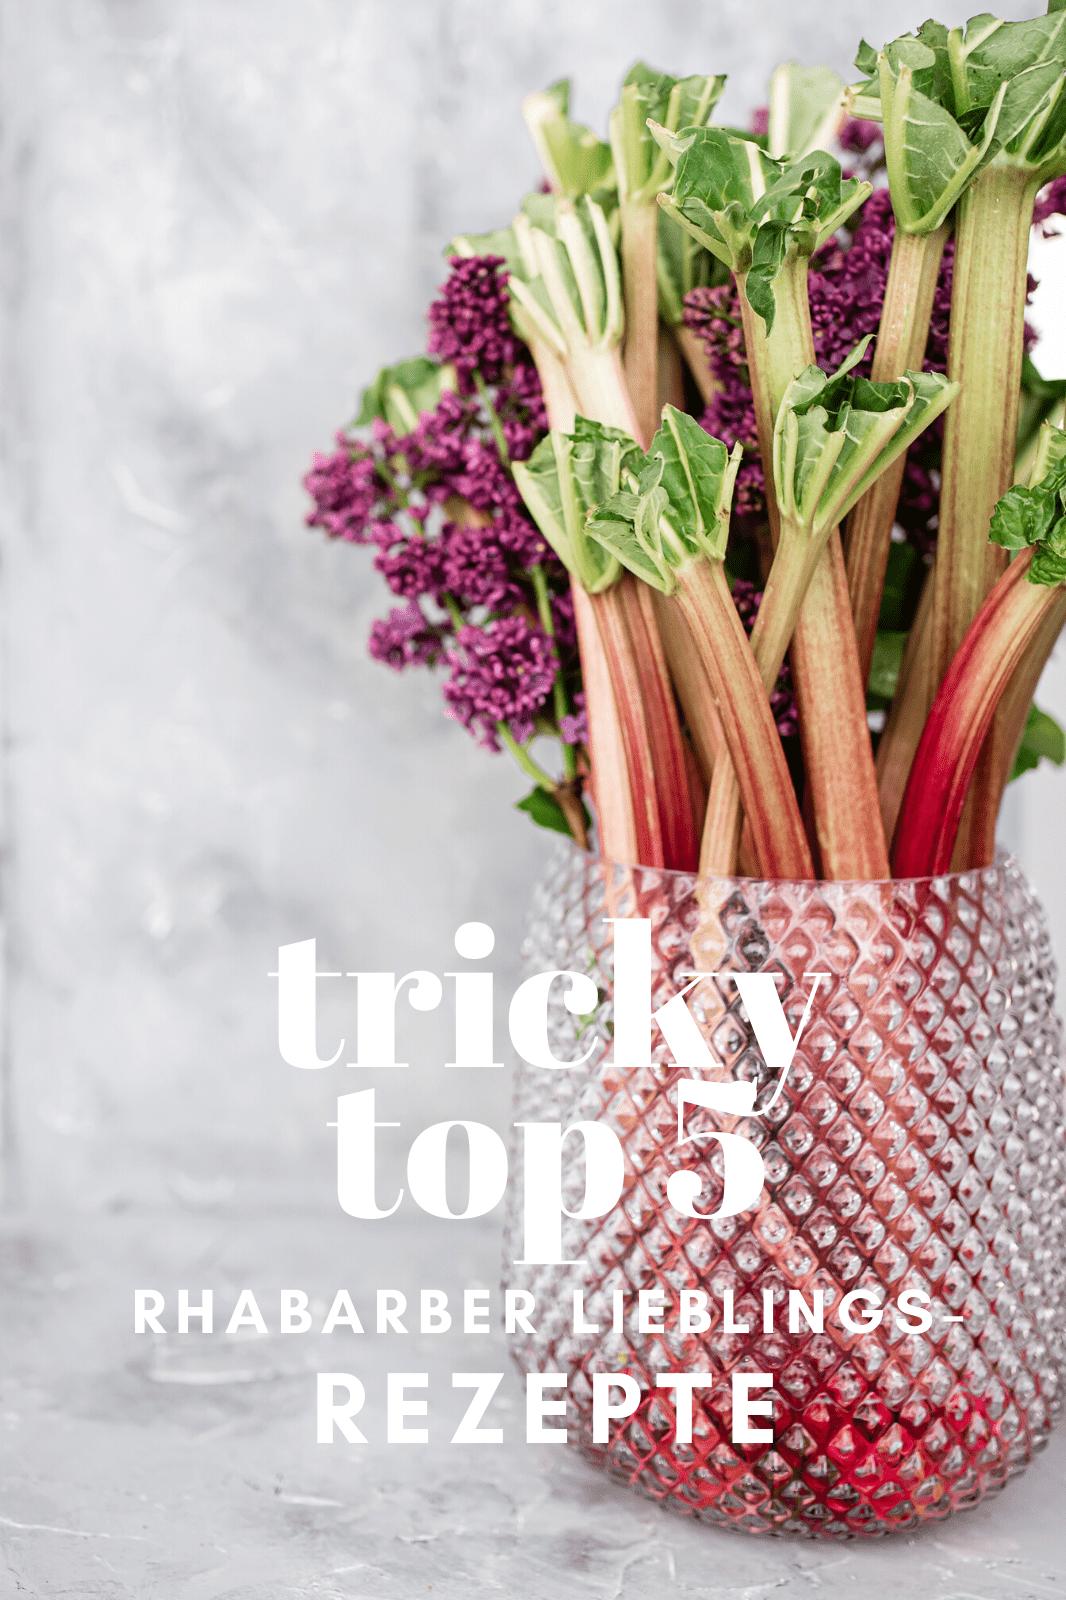 Rhabarber: meine tricky top 5 Lieblings-Rezepte - trickytine